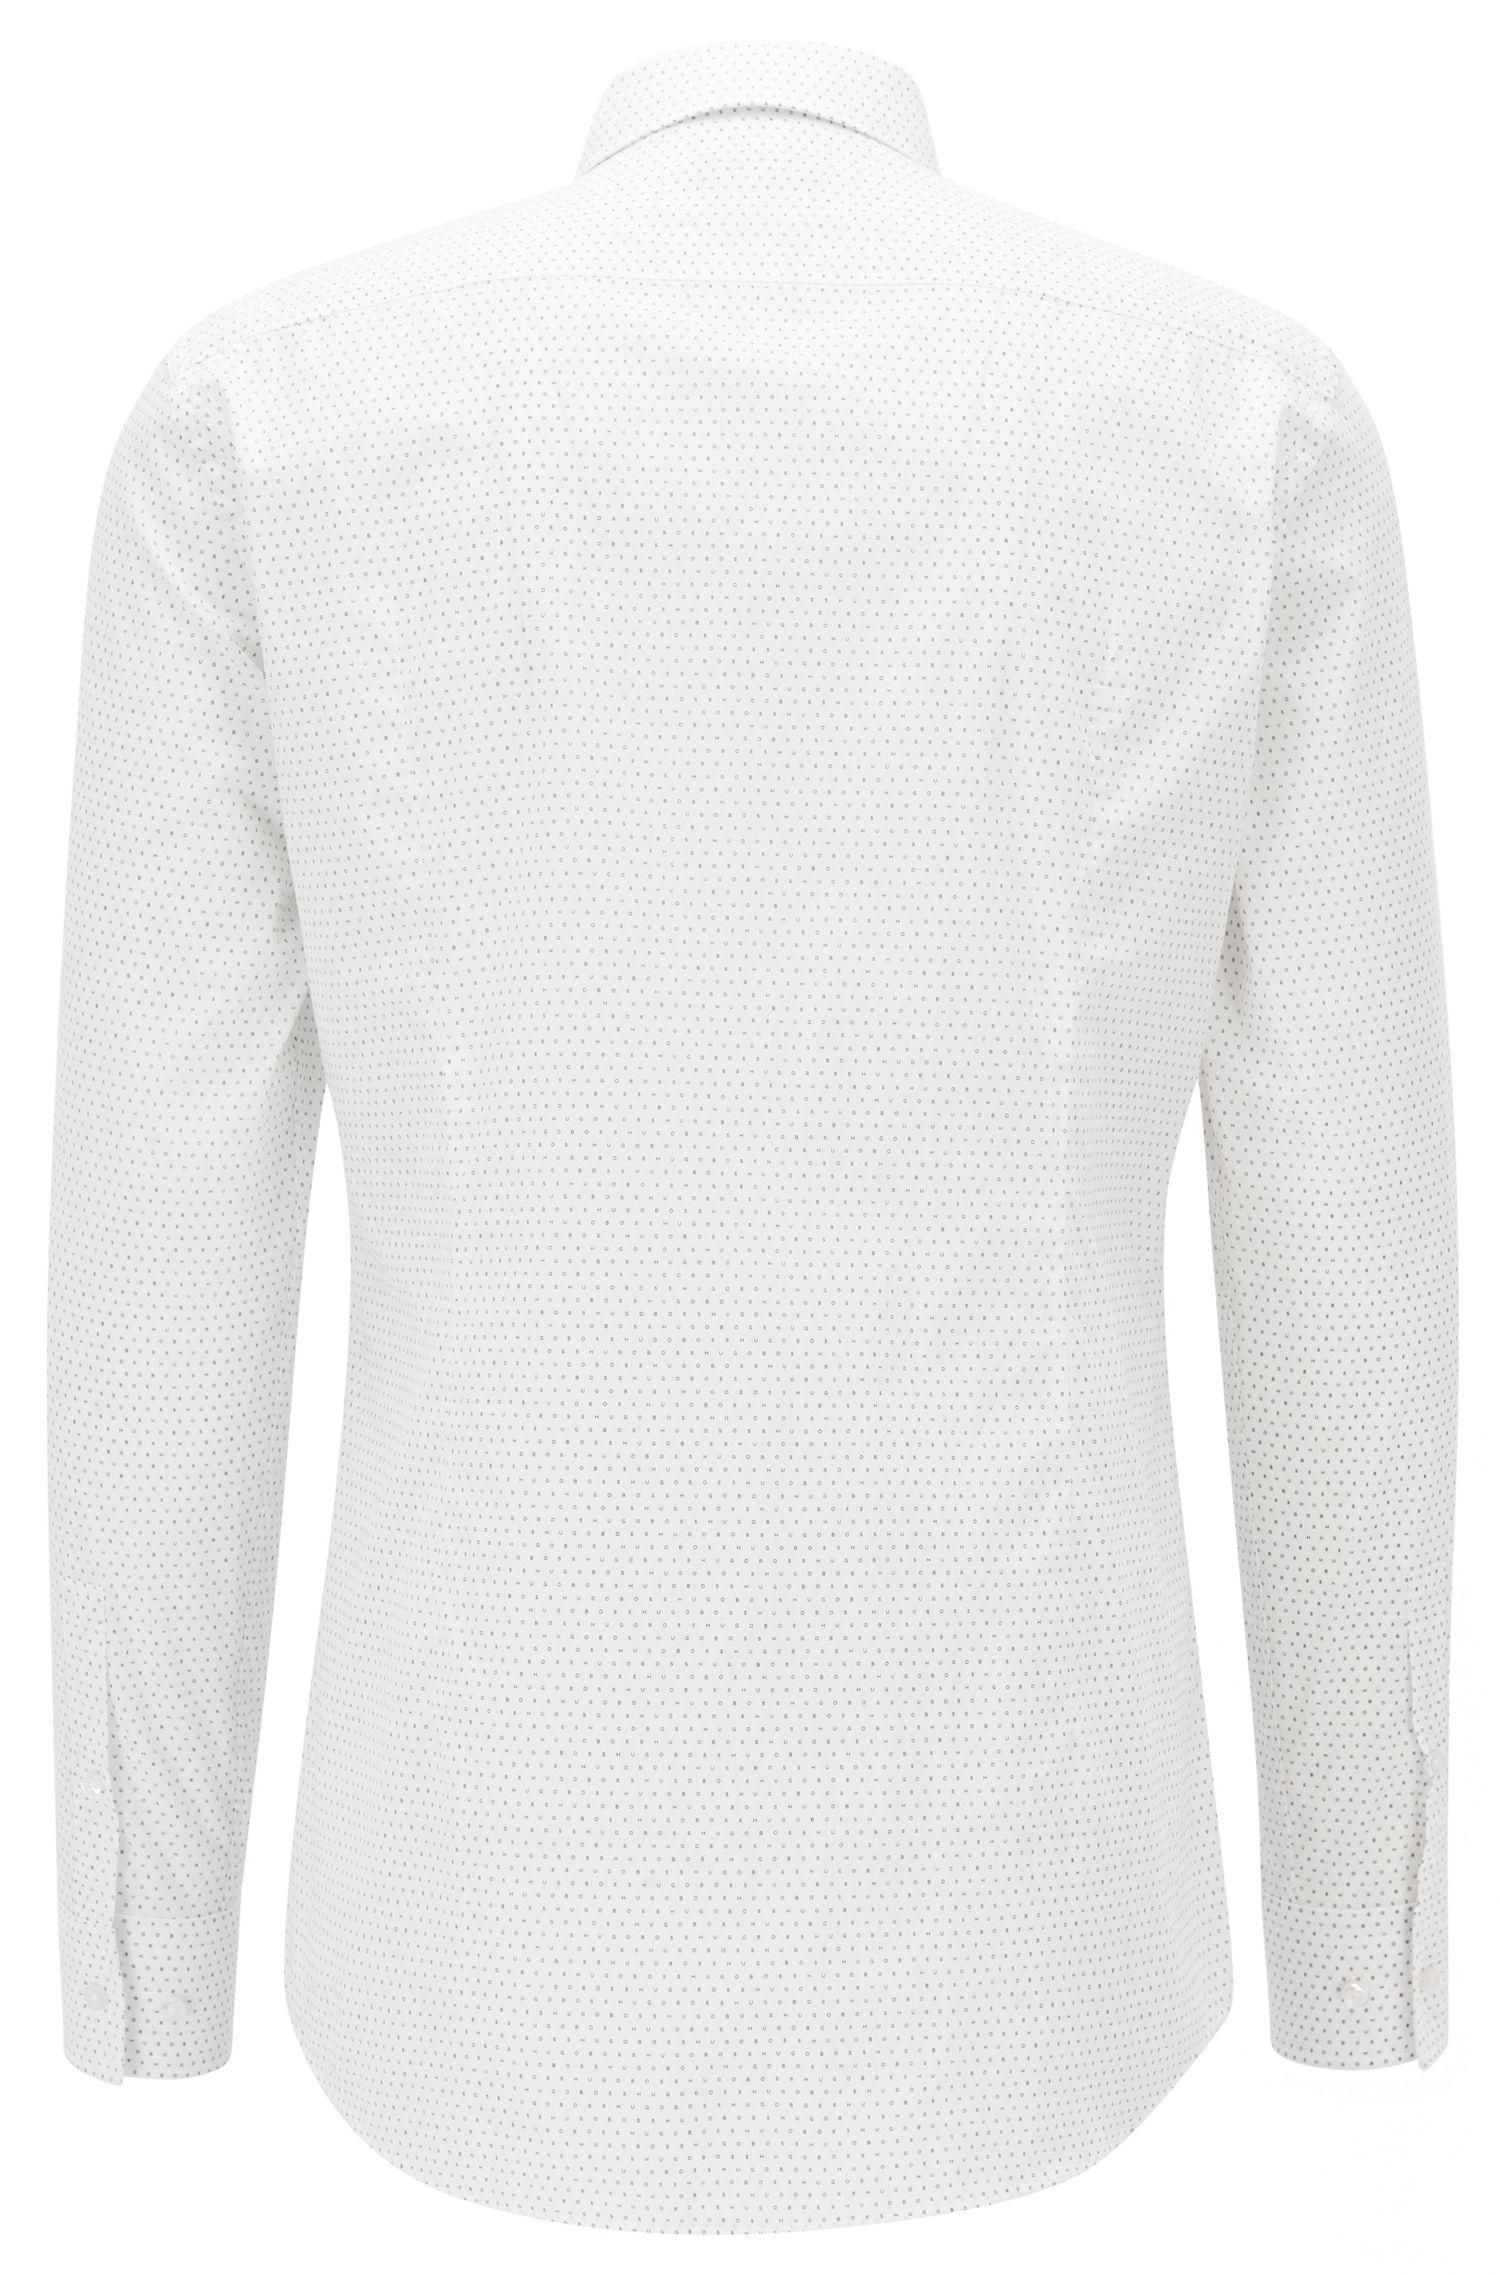 Dotted Cotton Dress Shirt, Slim Fit | Jenno, White